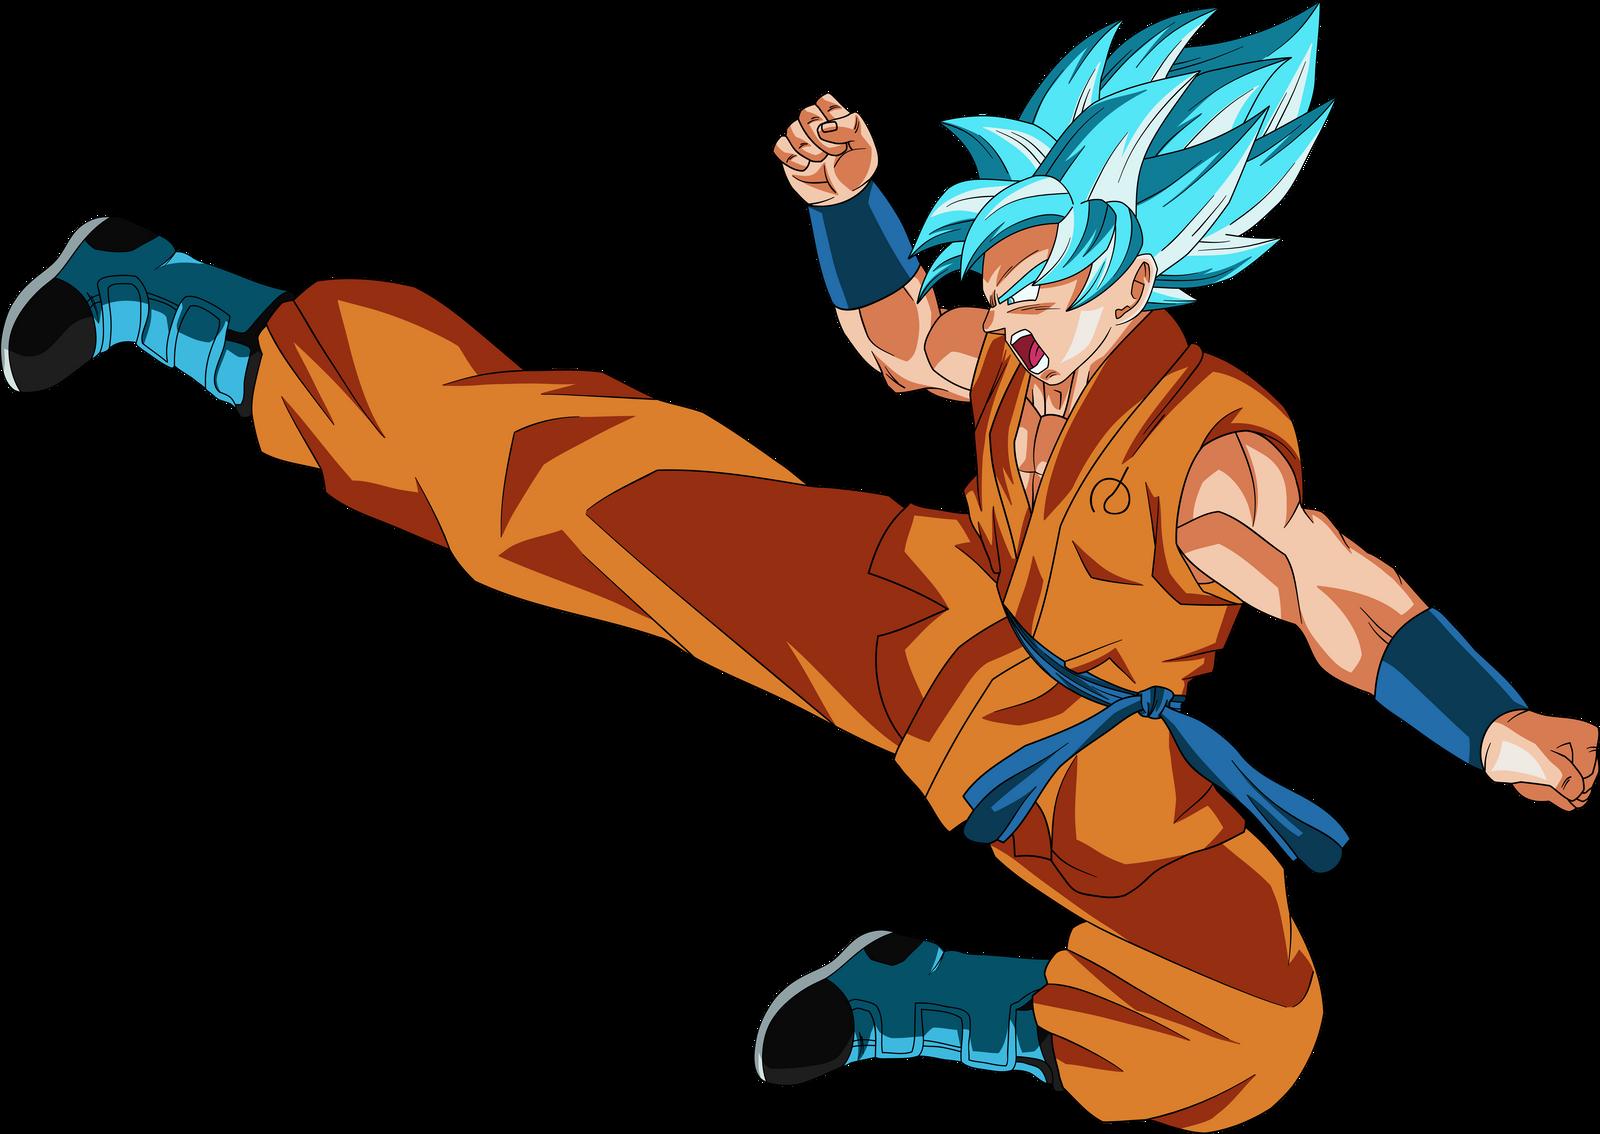 SSJ Blue Goku Kick By DragonBallAffinity On DeviantArt